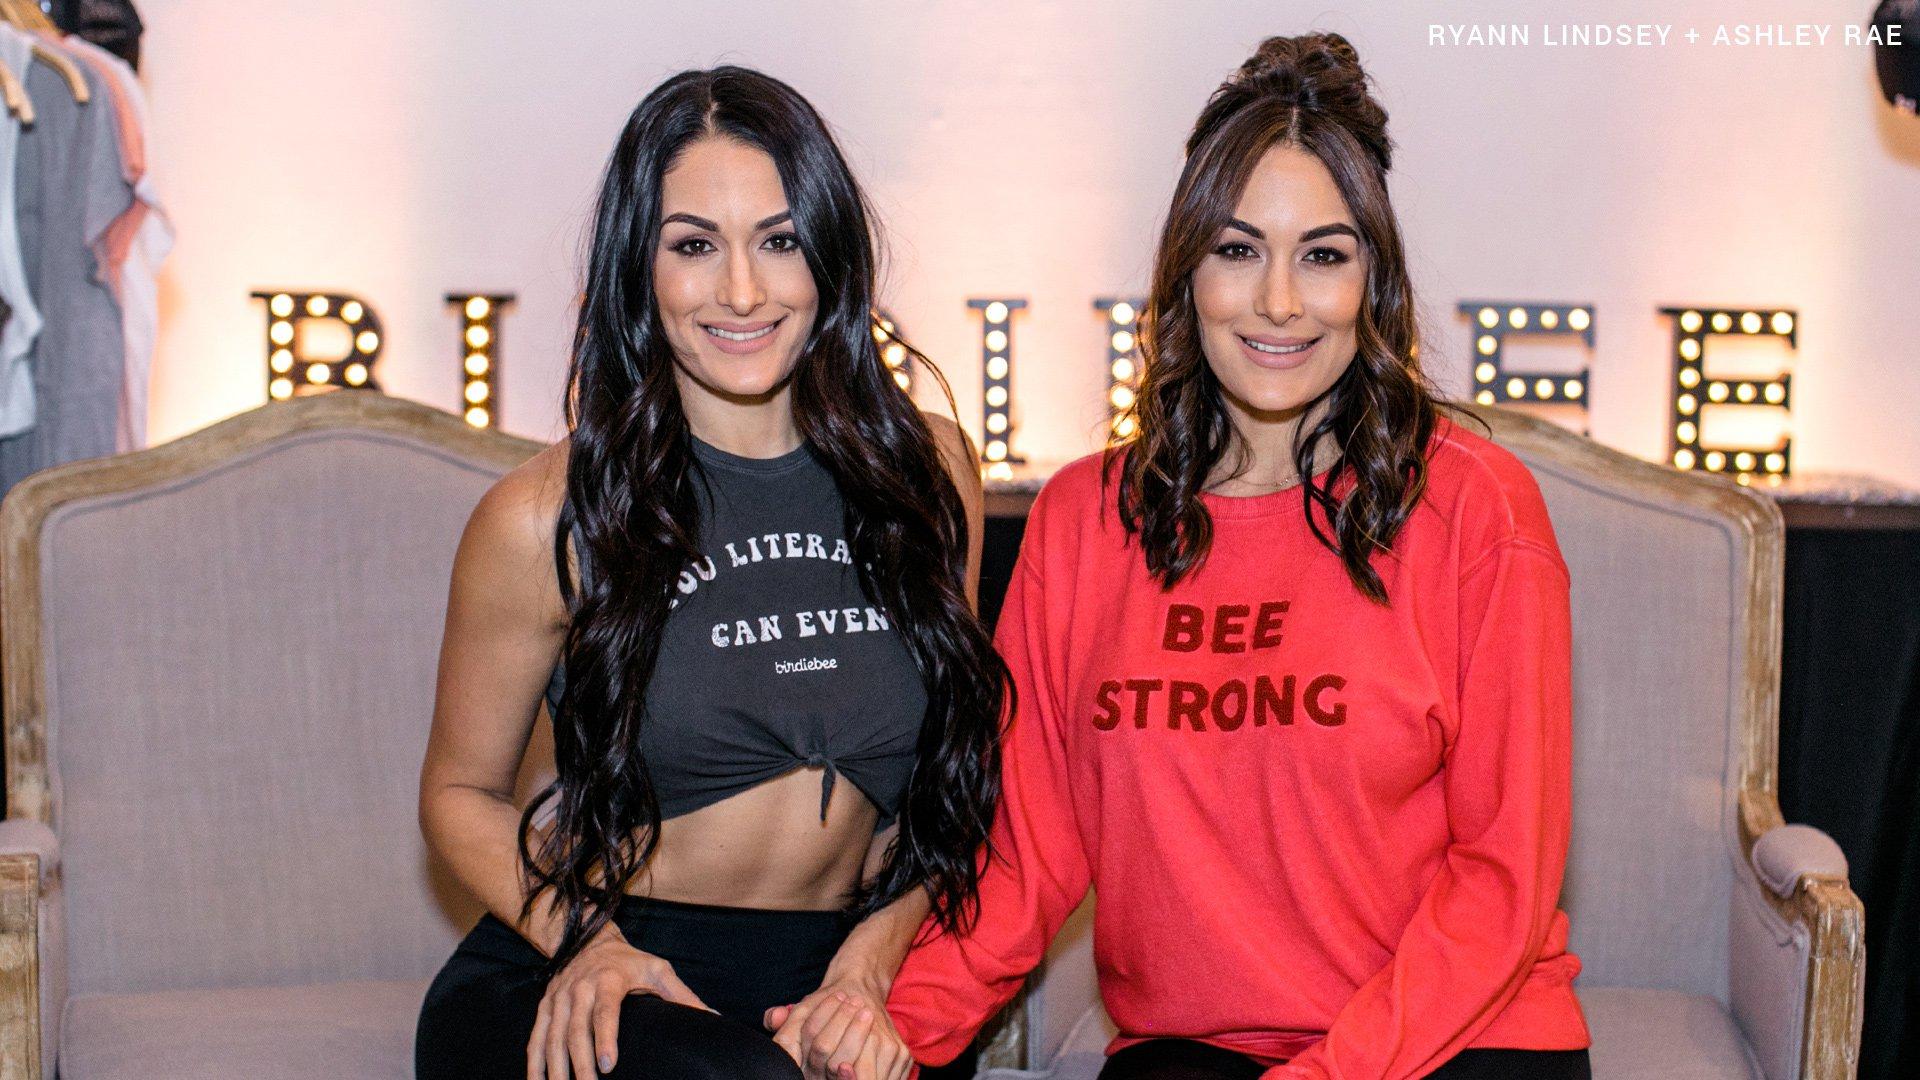 The Bella Twins celebrate the Birdiebee launch: photos